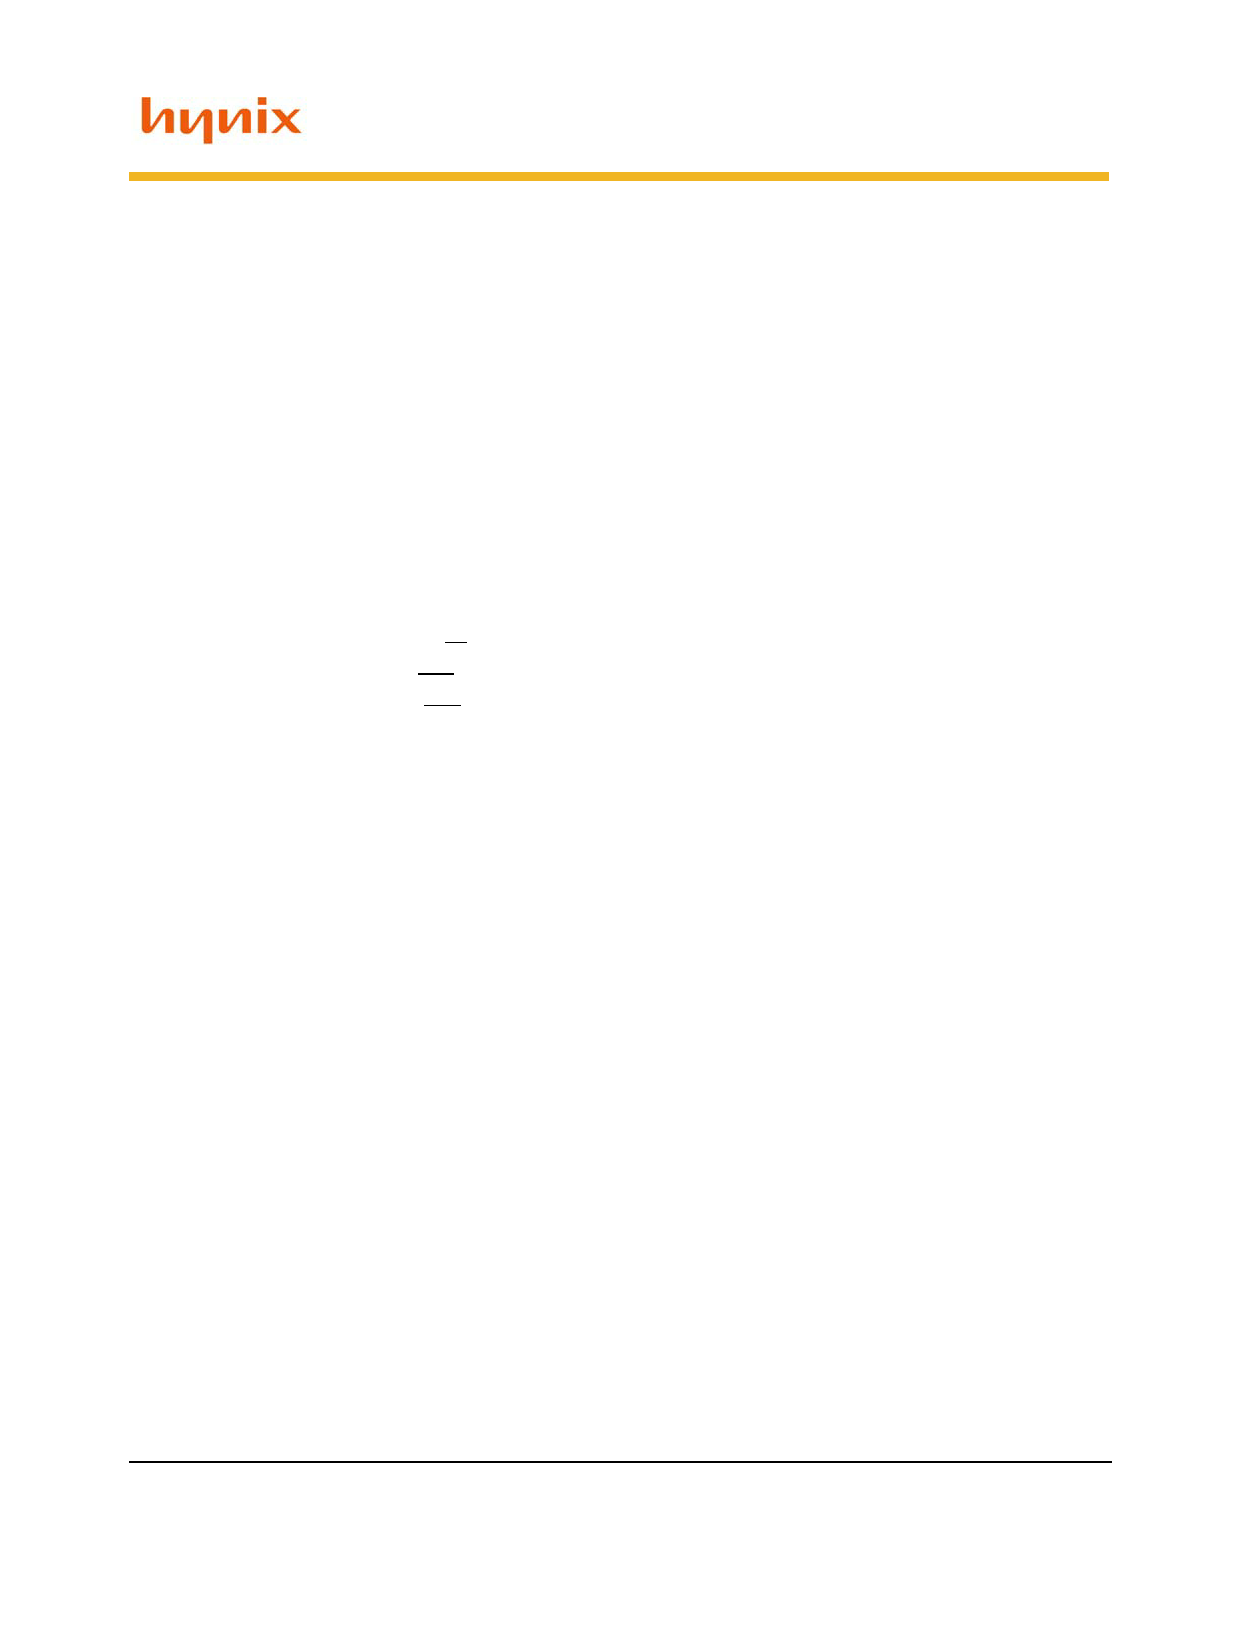 H5TQ4G63MFR-xxC Даташит, Описание, Даташиты